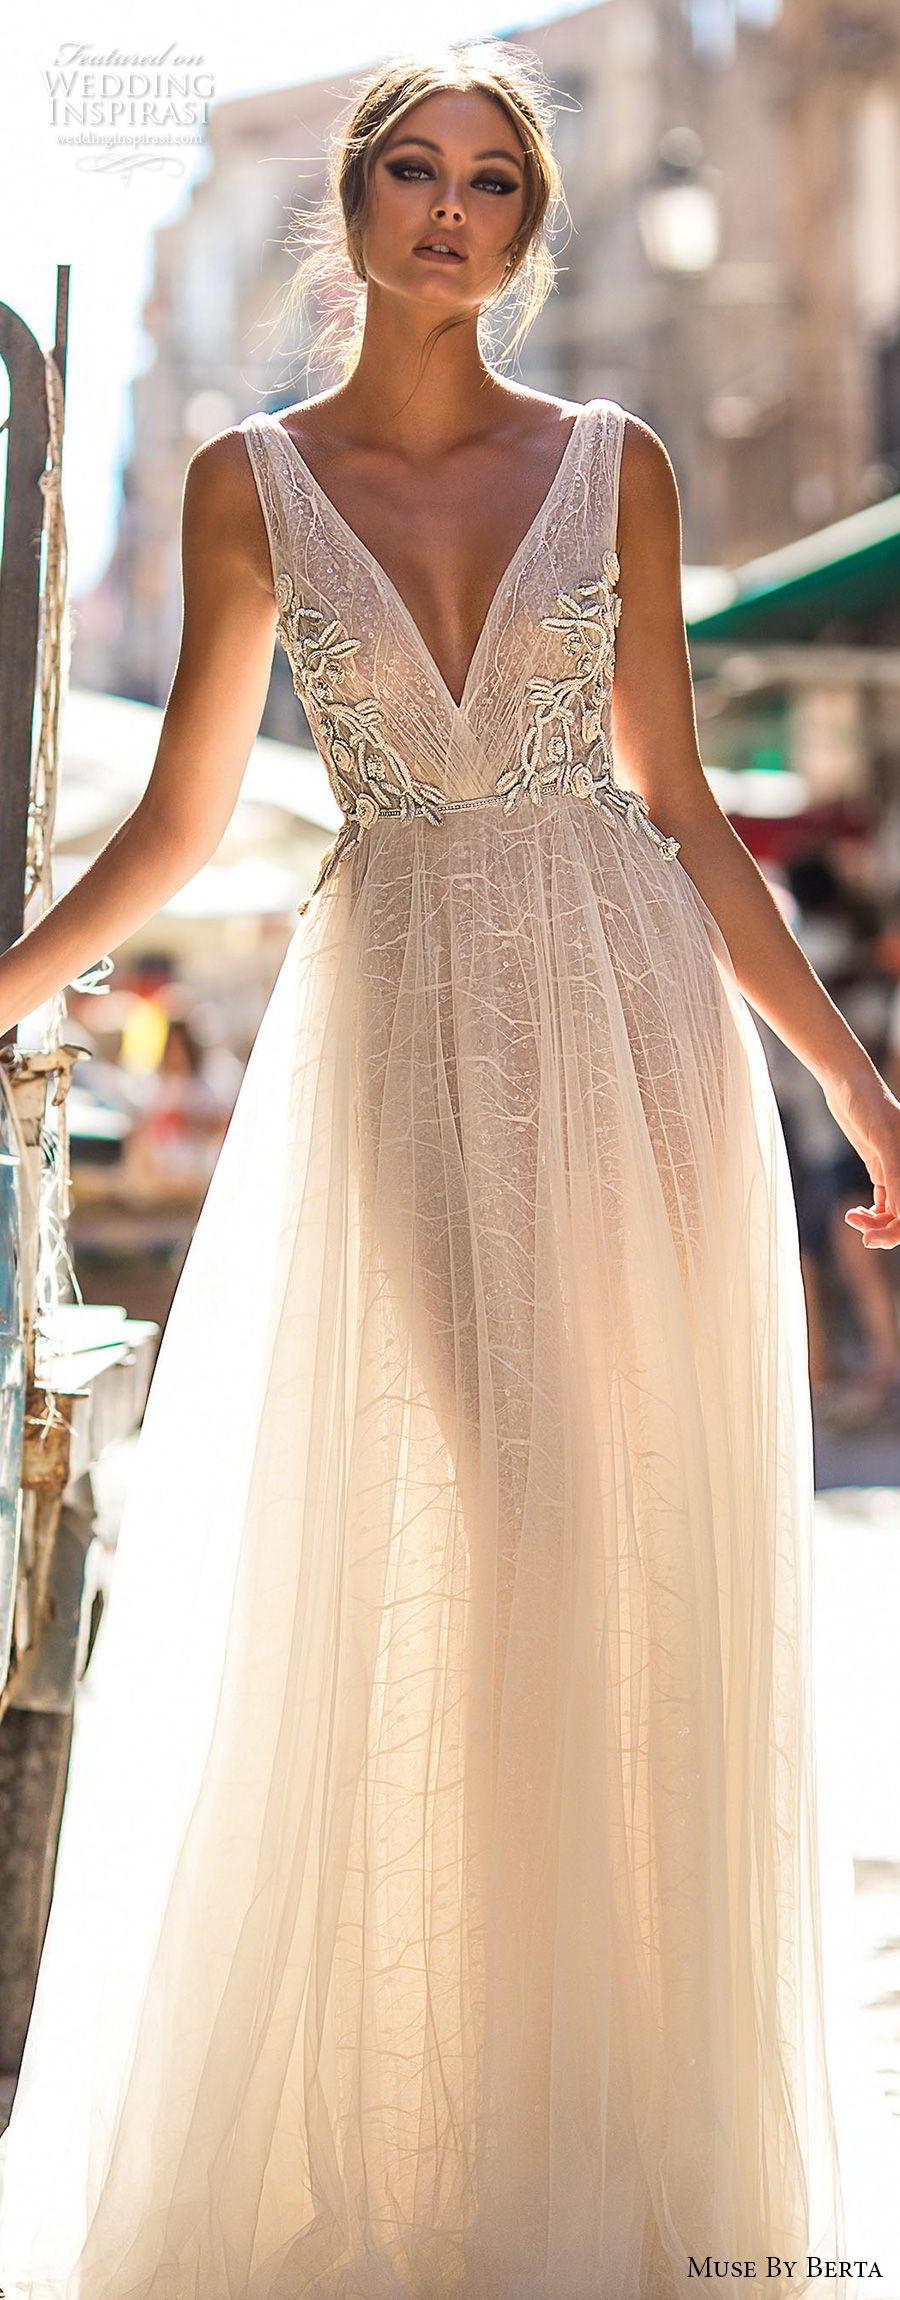 muse-berta-2018-bridal-sleeveless-deep-v-neck-lightly-embellished-bodice-tulle-skirt-romantic-soft-a-line-wedding-dress-open-v-back-medium-train-4-lv